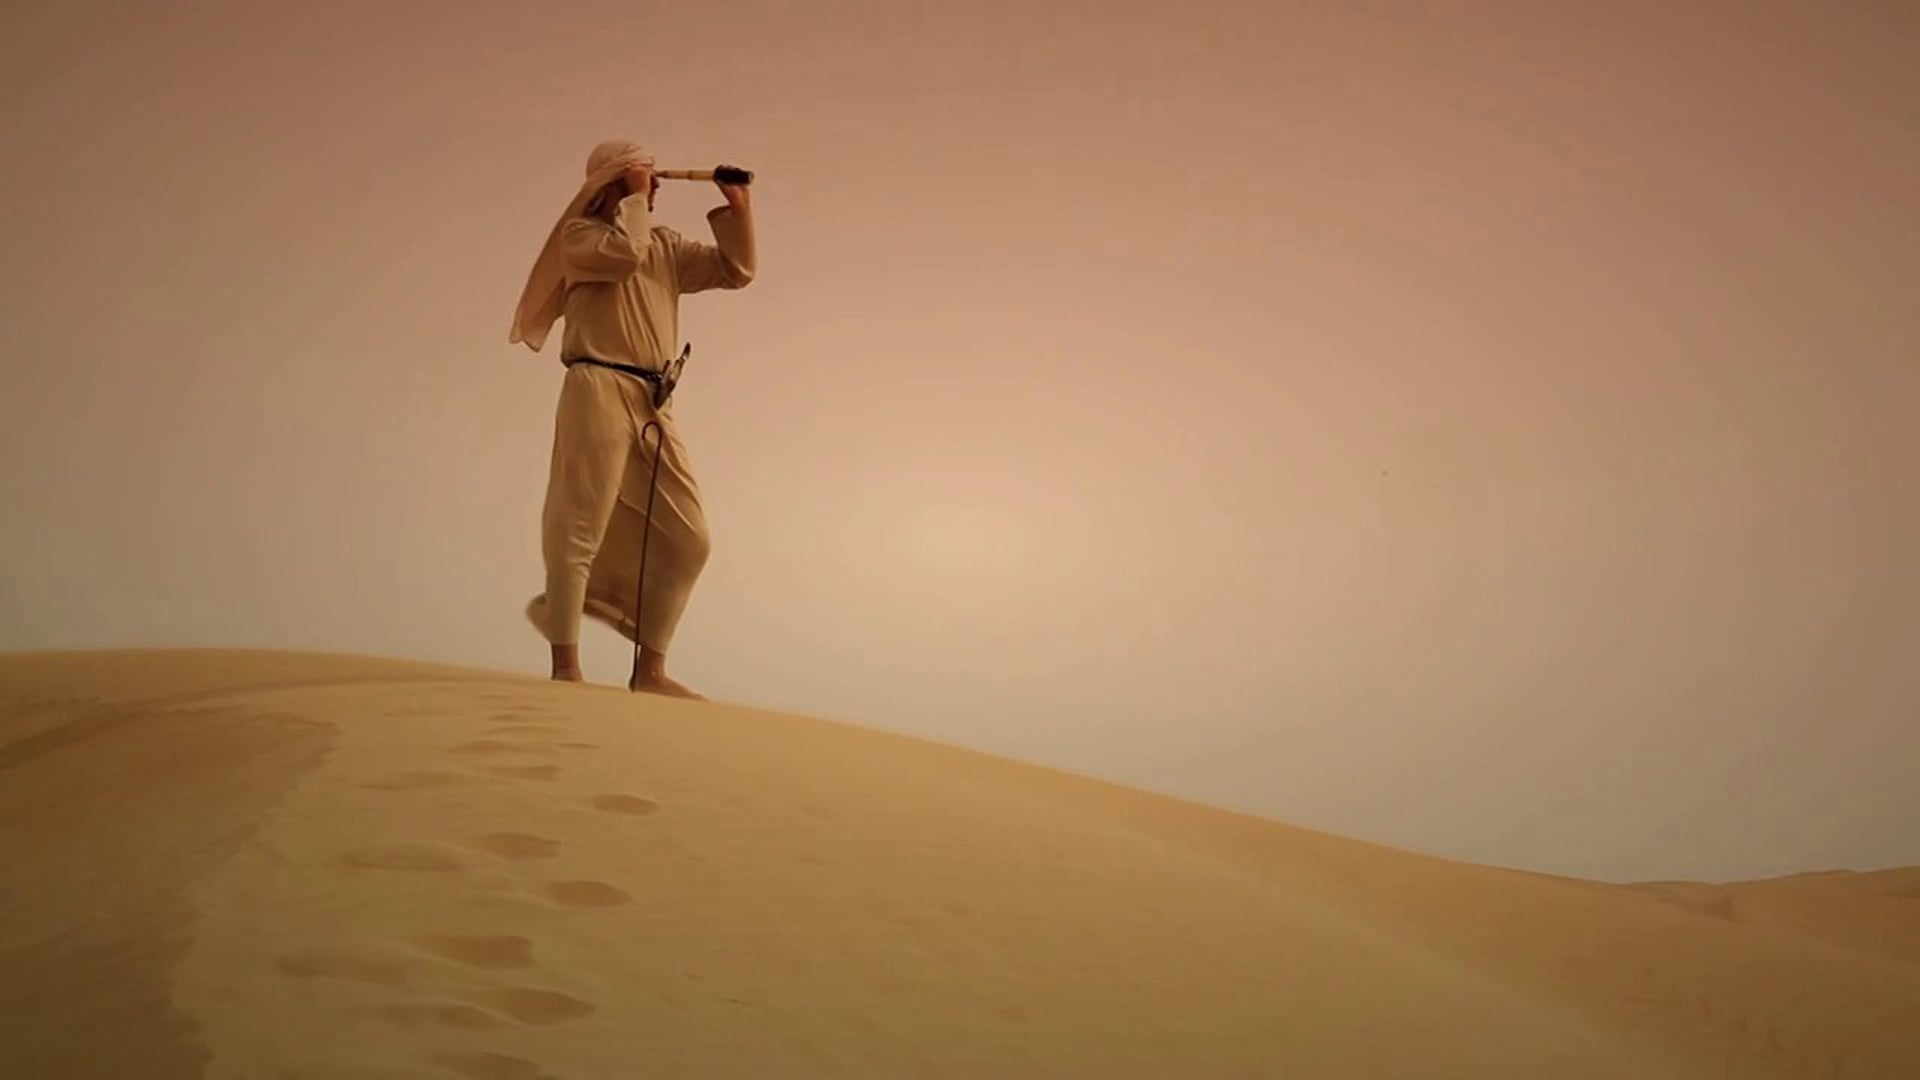 The Explorers of Arabia - Trailer